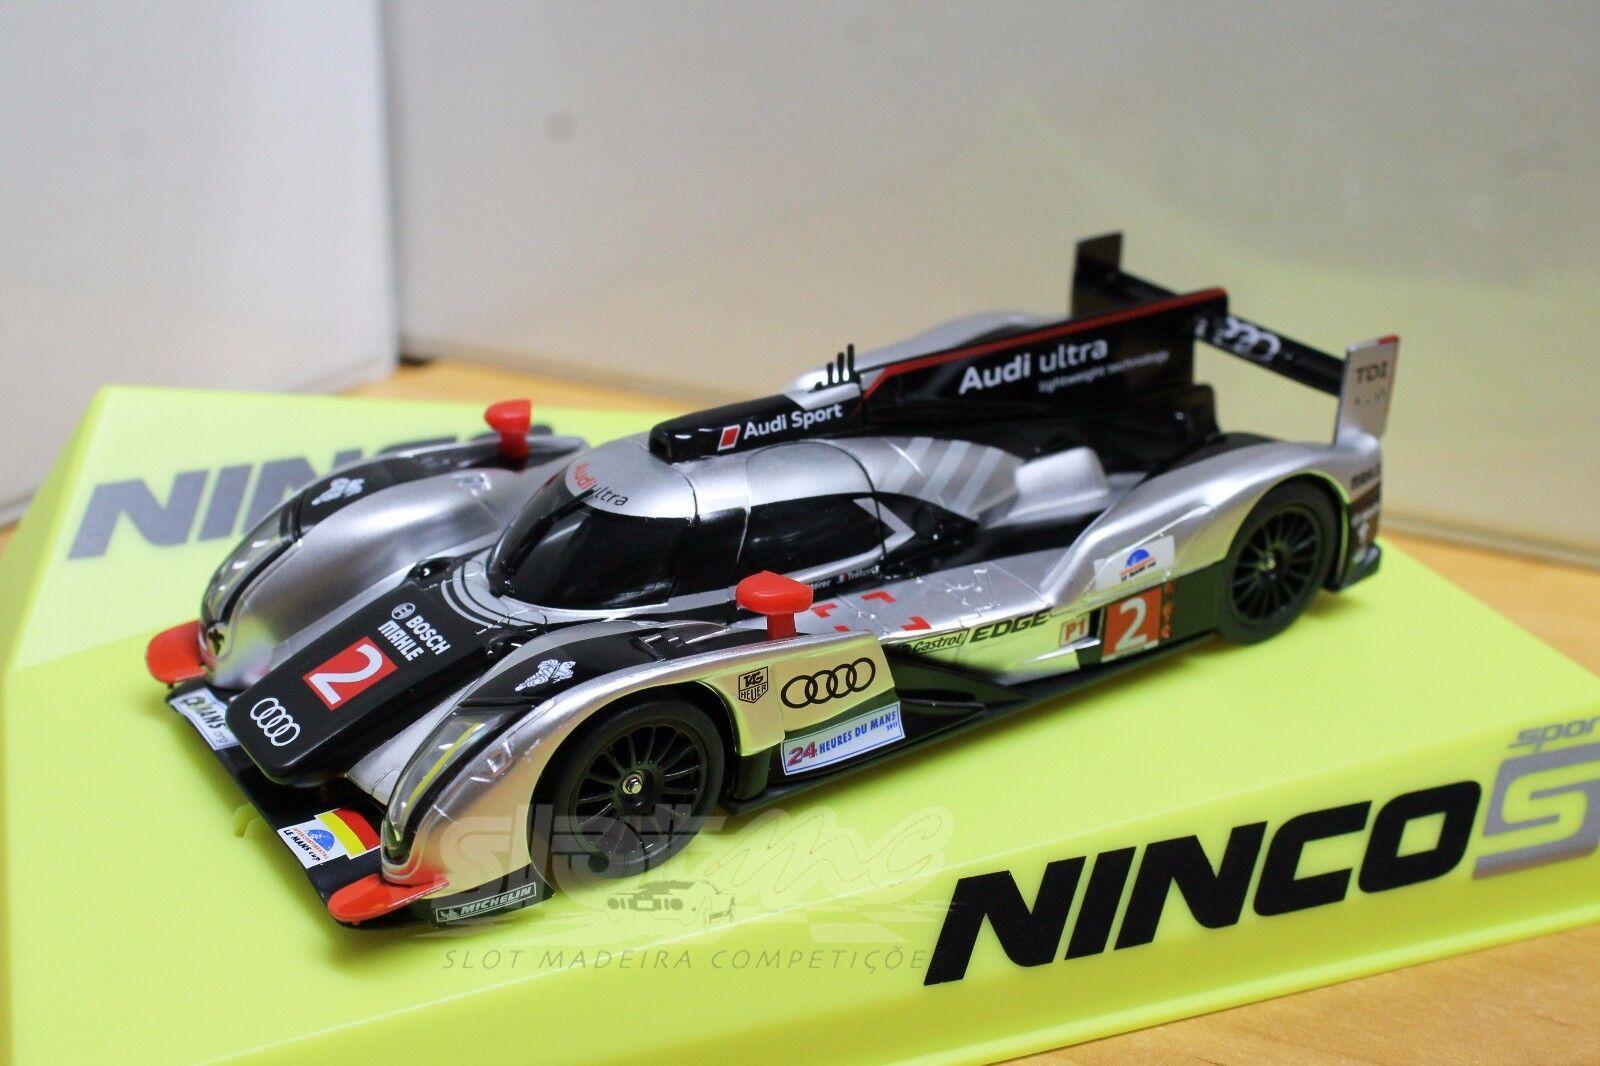 Ninco 50612 I R18 LE MANS vainqueur 2011 1 32  NEW